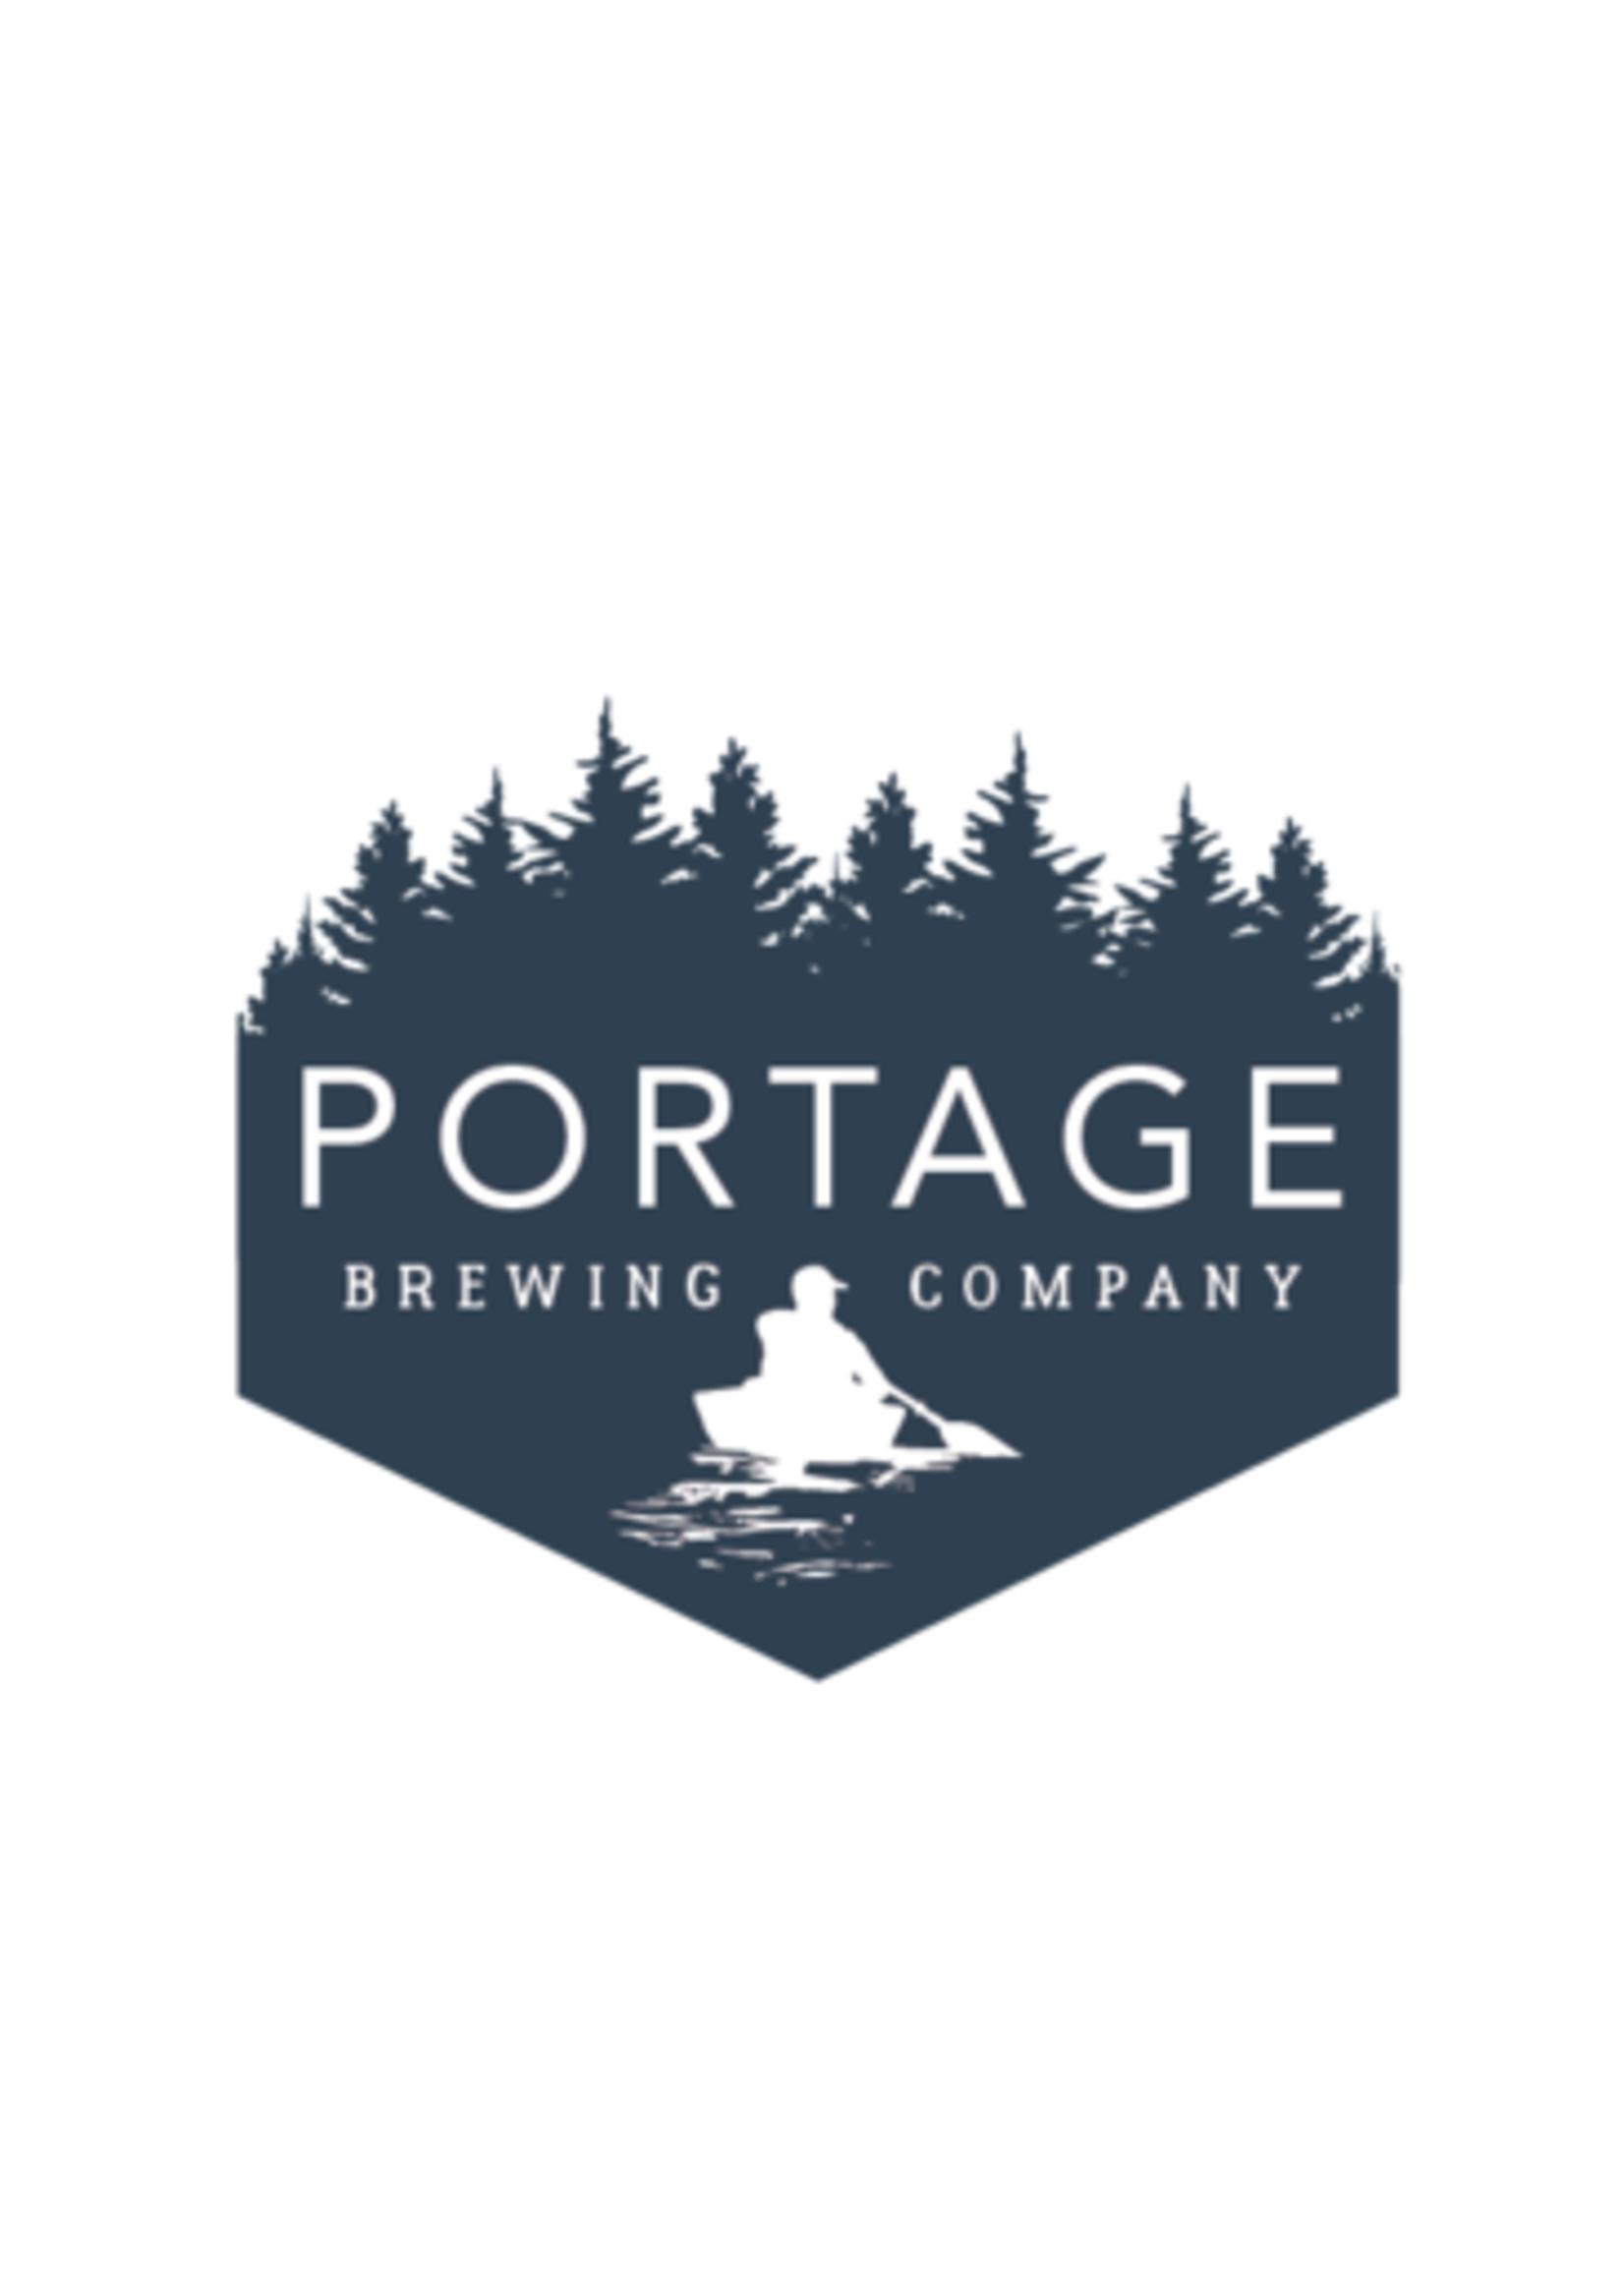 Portage Brewing Tiny Approach Mixed Fermentation Saison - 750ml Bottle